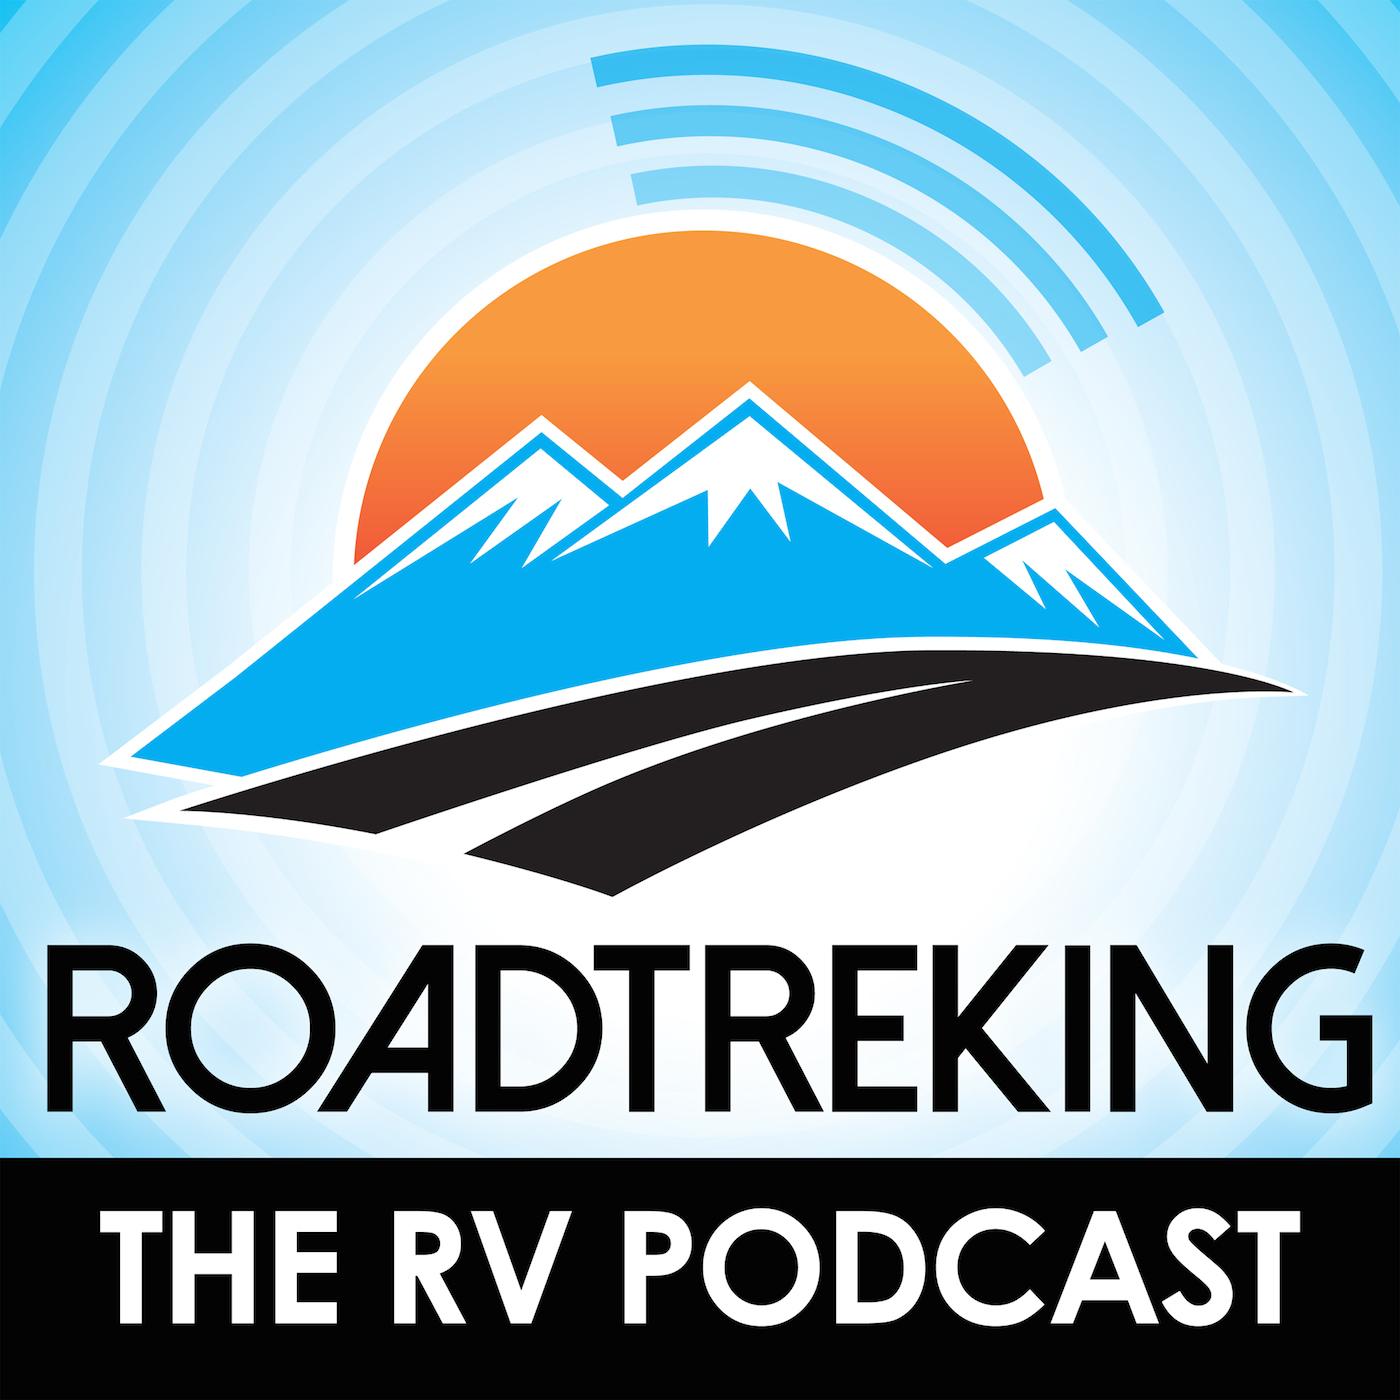 Roadtreking - The RV Podcast